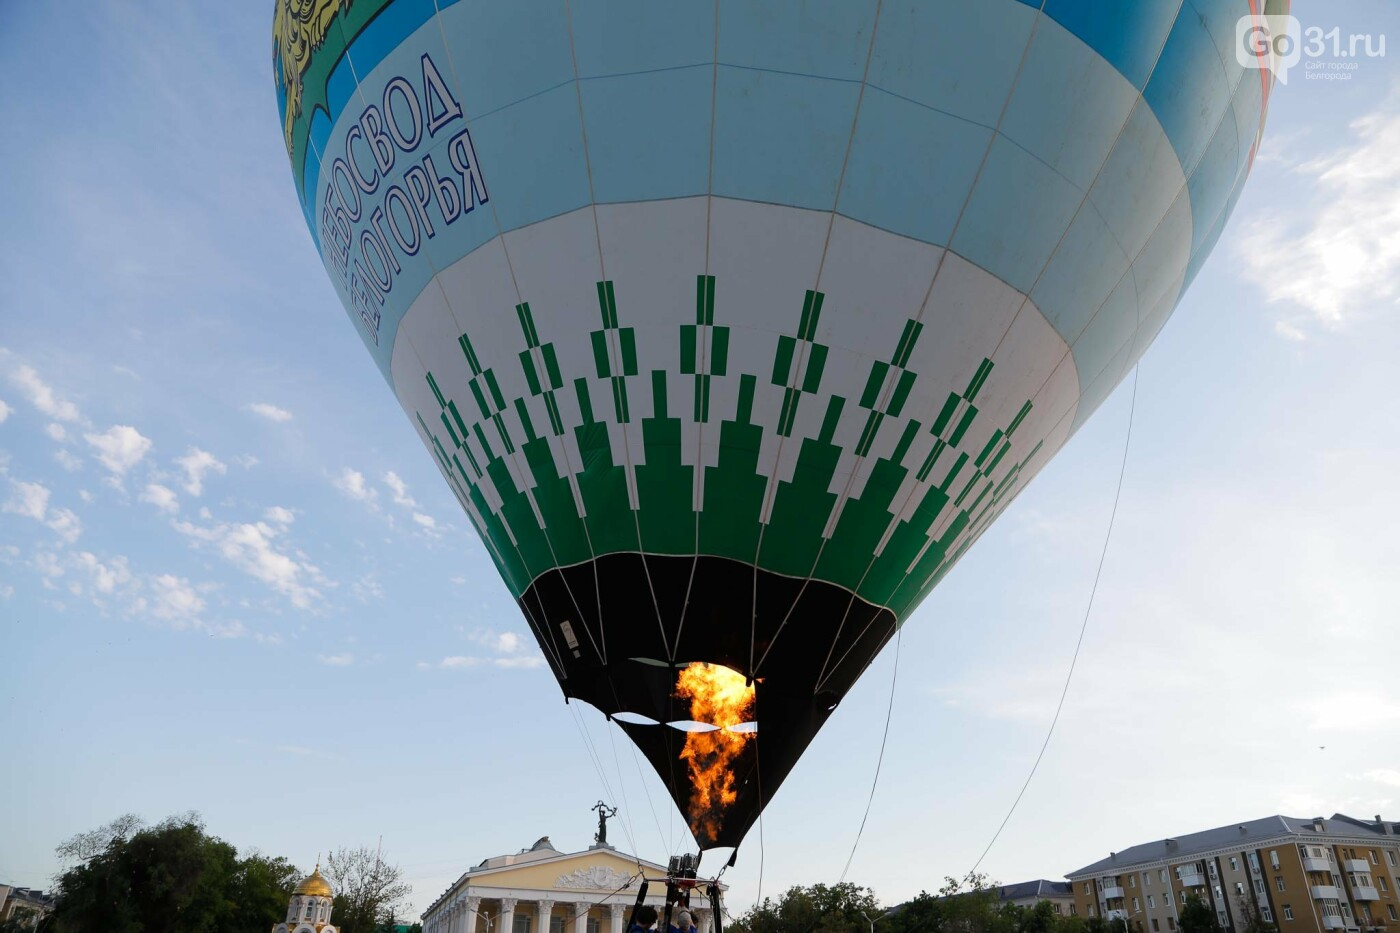 Над Белгородом пролетел аэростат с гигантским триколором, фото-21, Фото: Антон Вергун